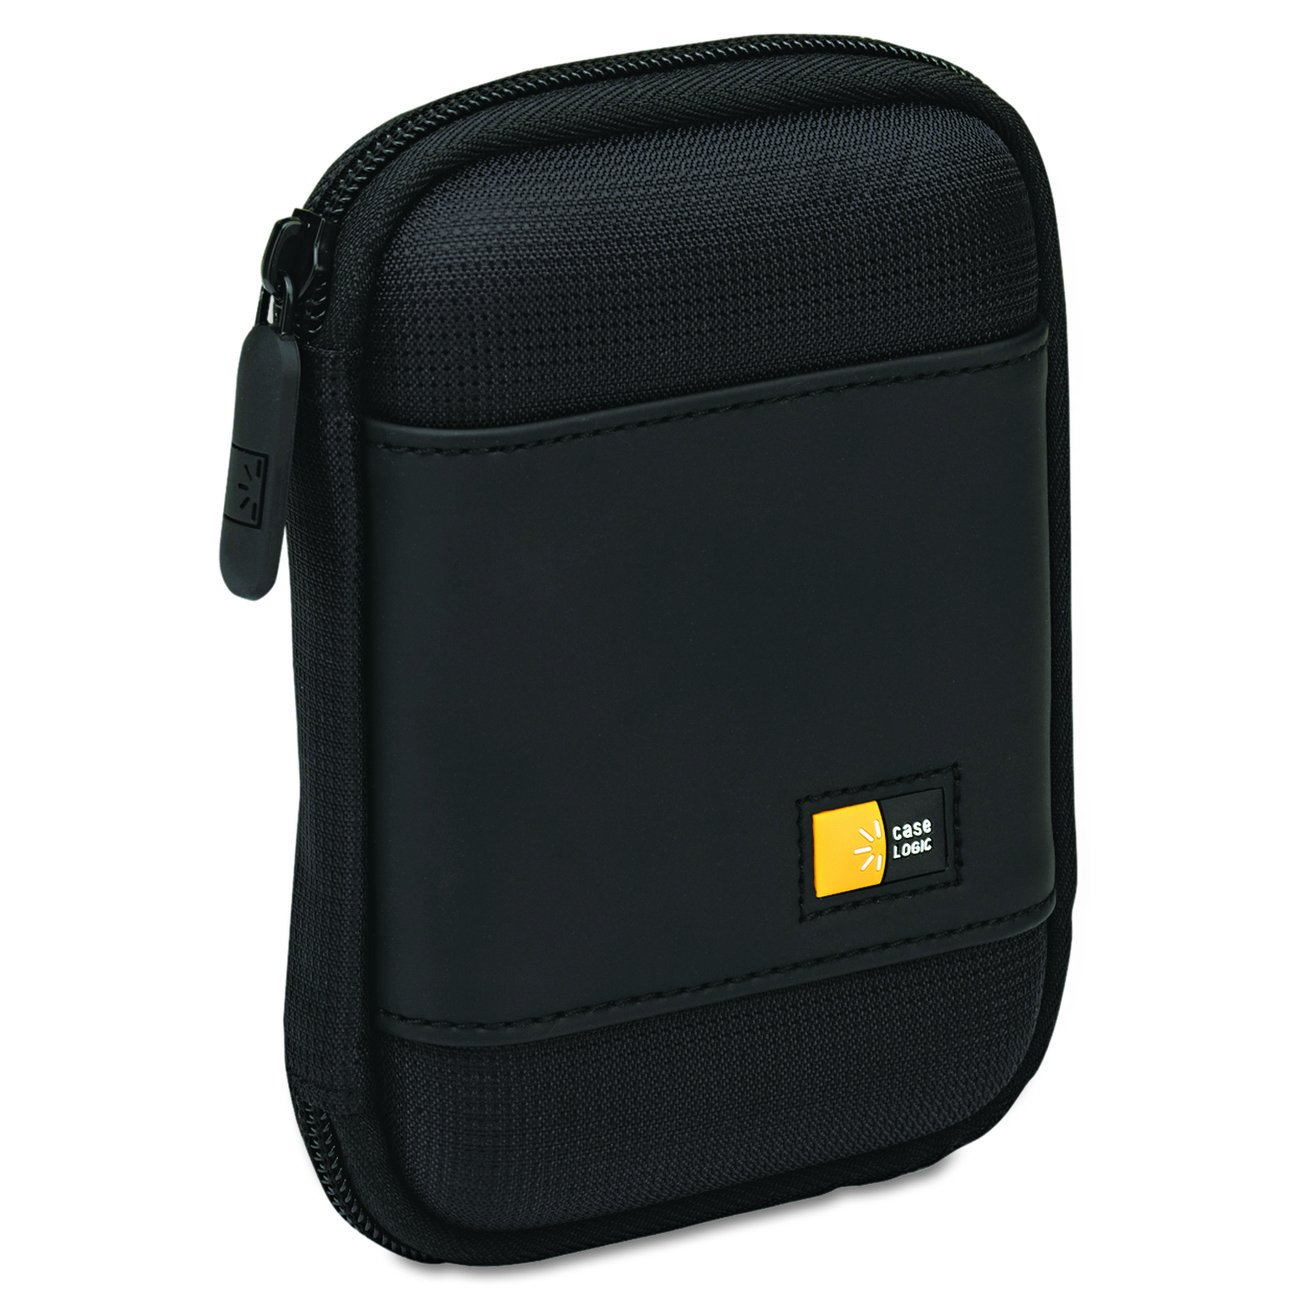 Case Logic PHDC-1 Compact Portable Hard Drive Case (Black)